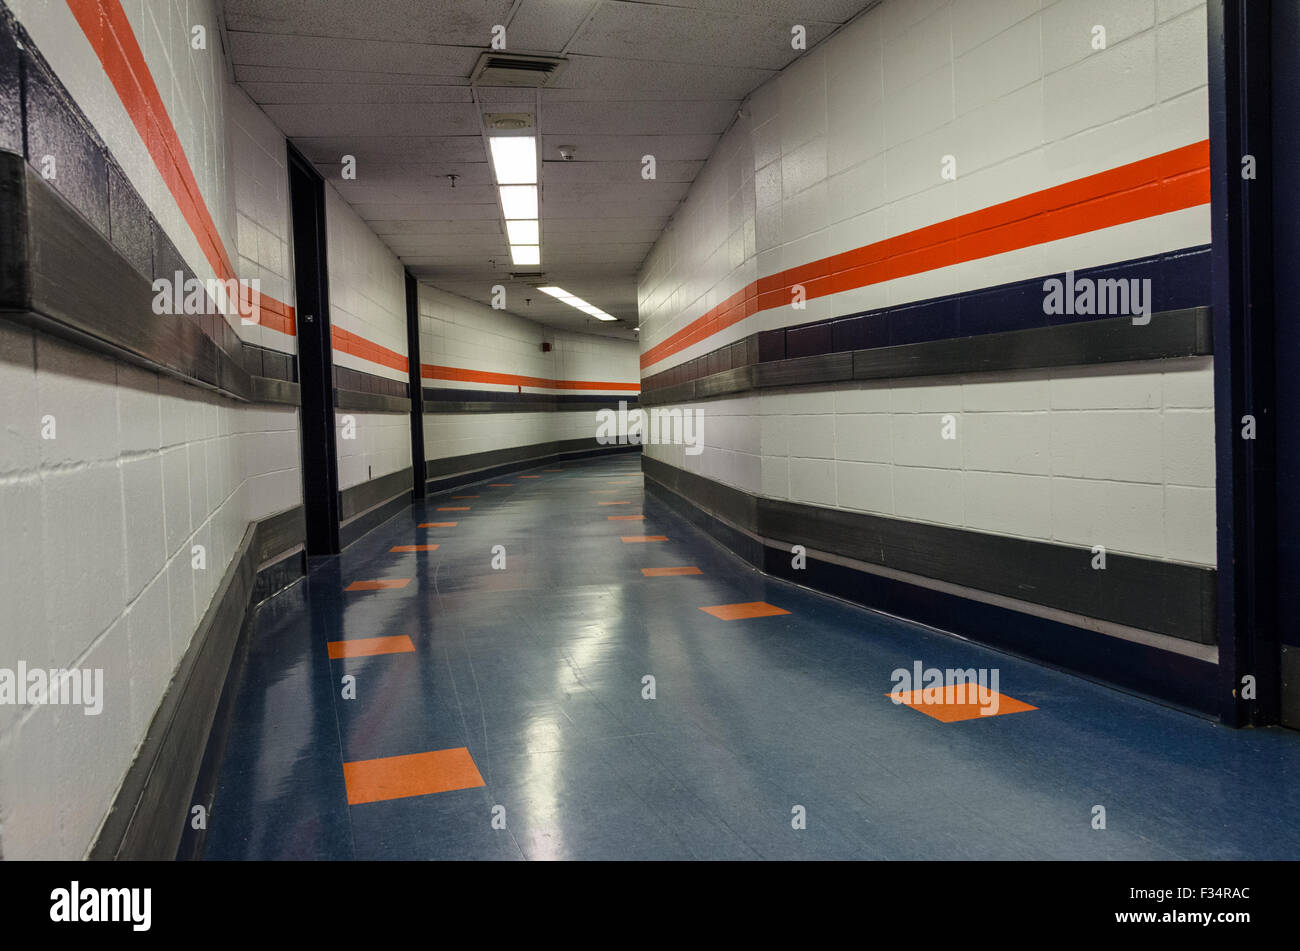 Nassau Coliseum hallway below level - Stock Image